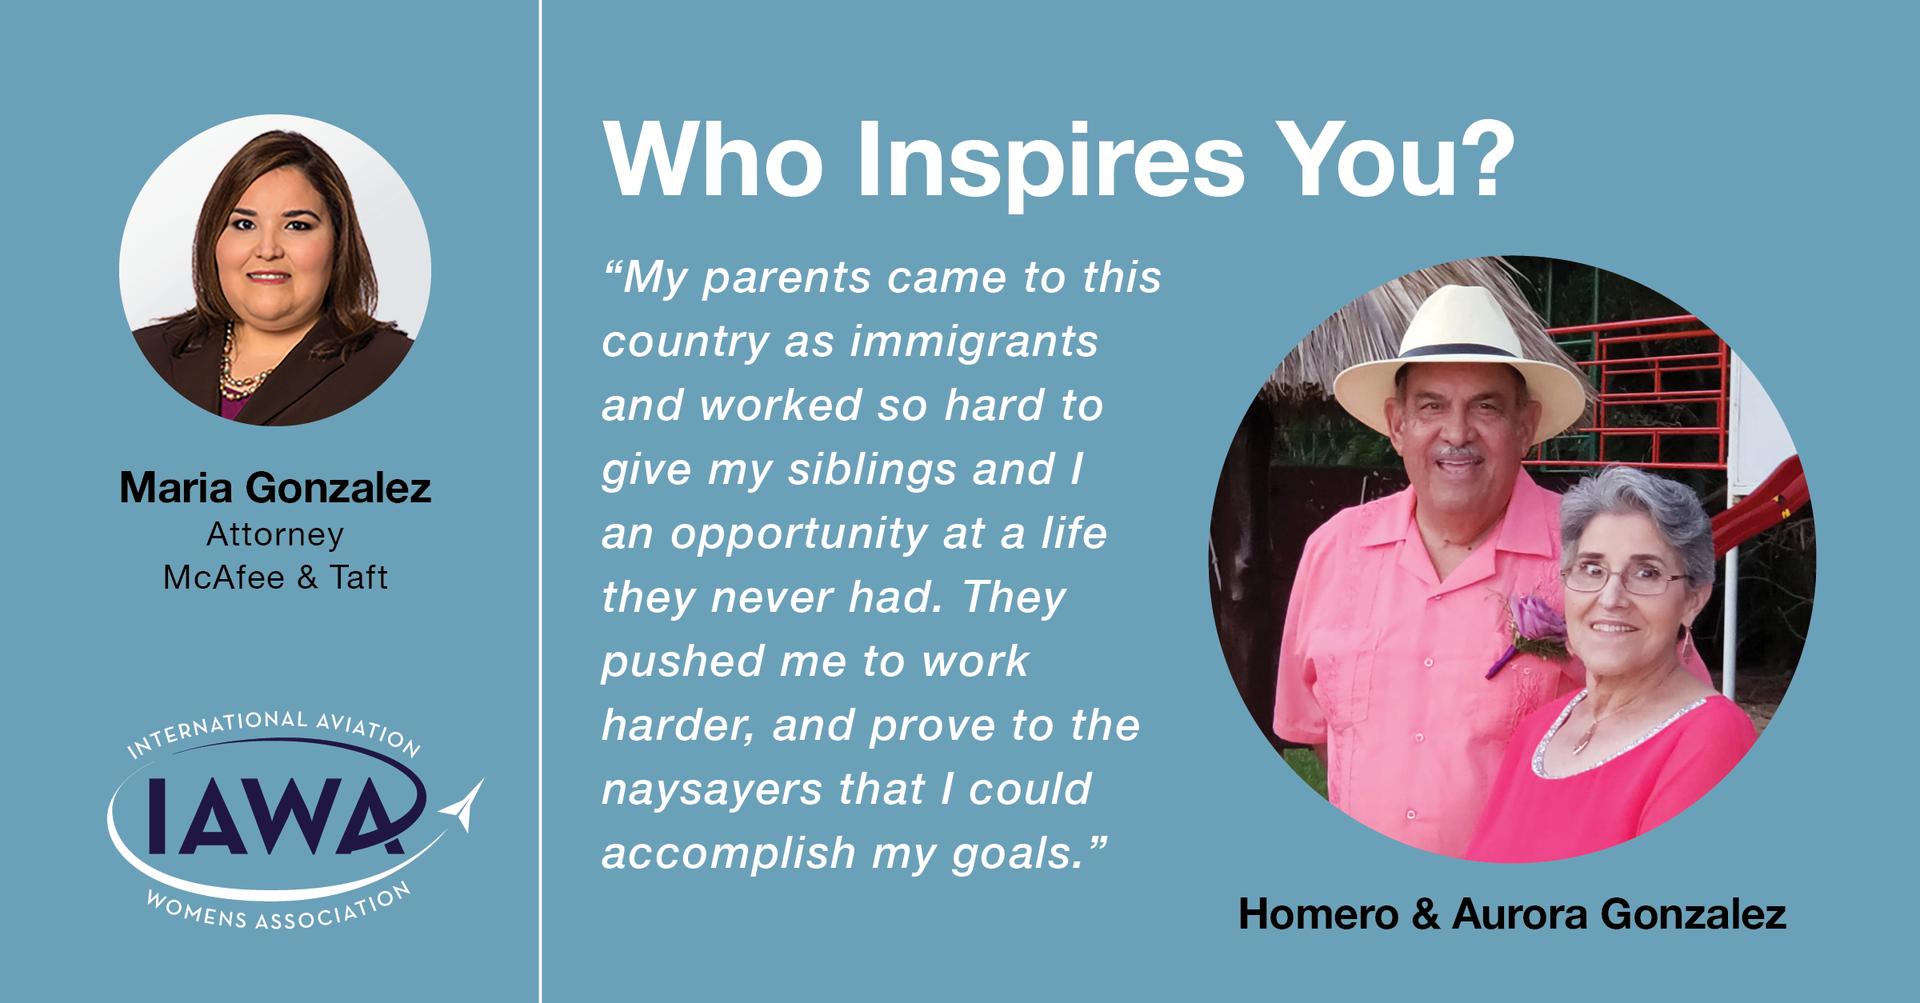 Maria Gonzalez finds inspiration in her parents.